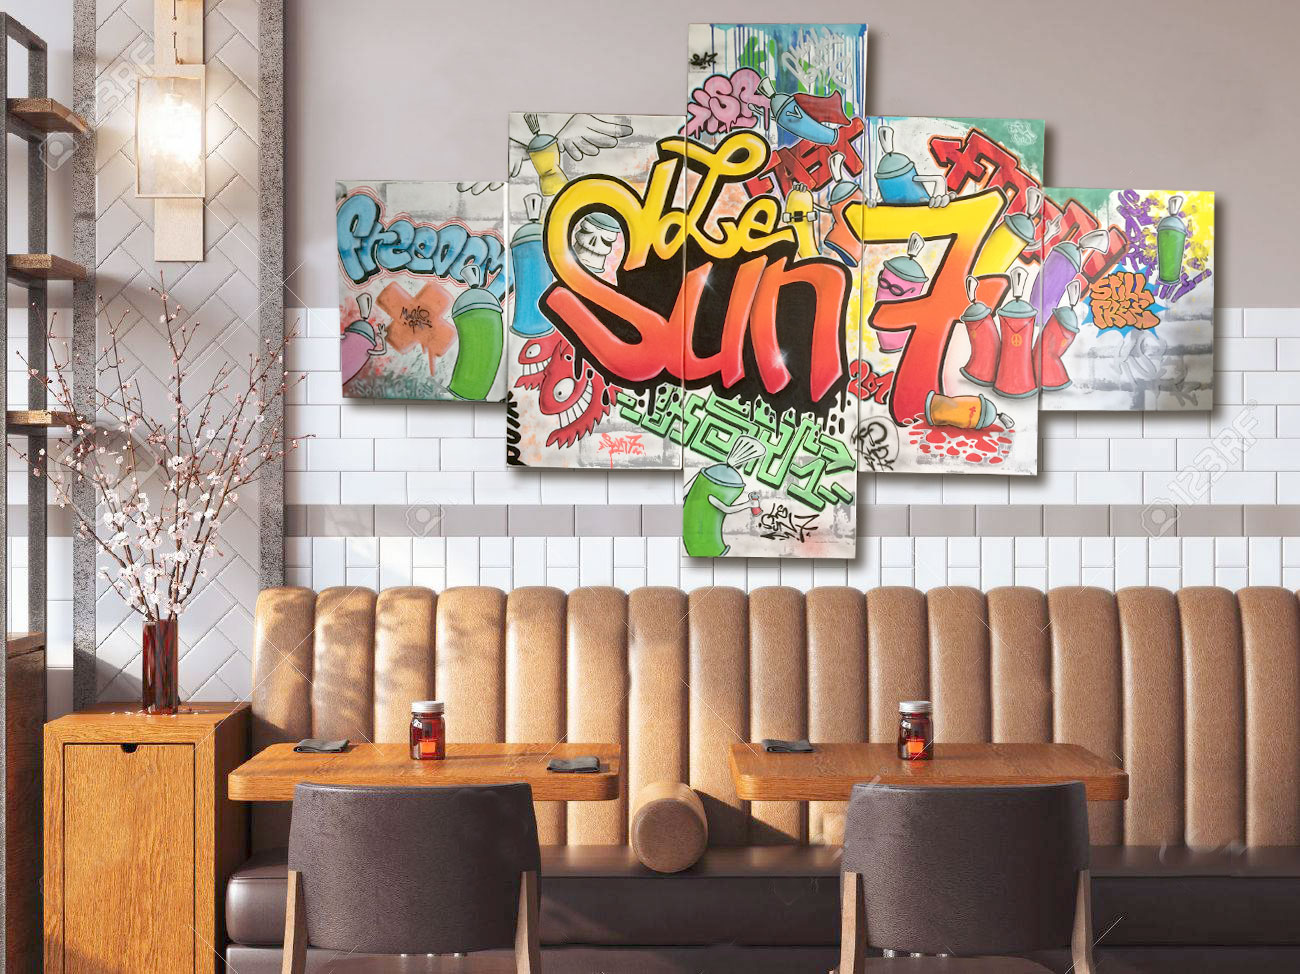 toile-sun7-restaurant-geograffeur